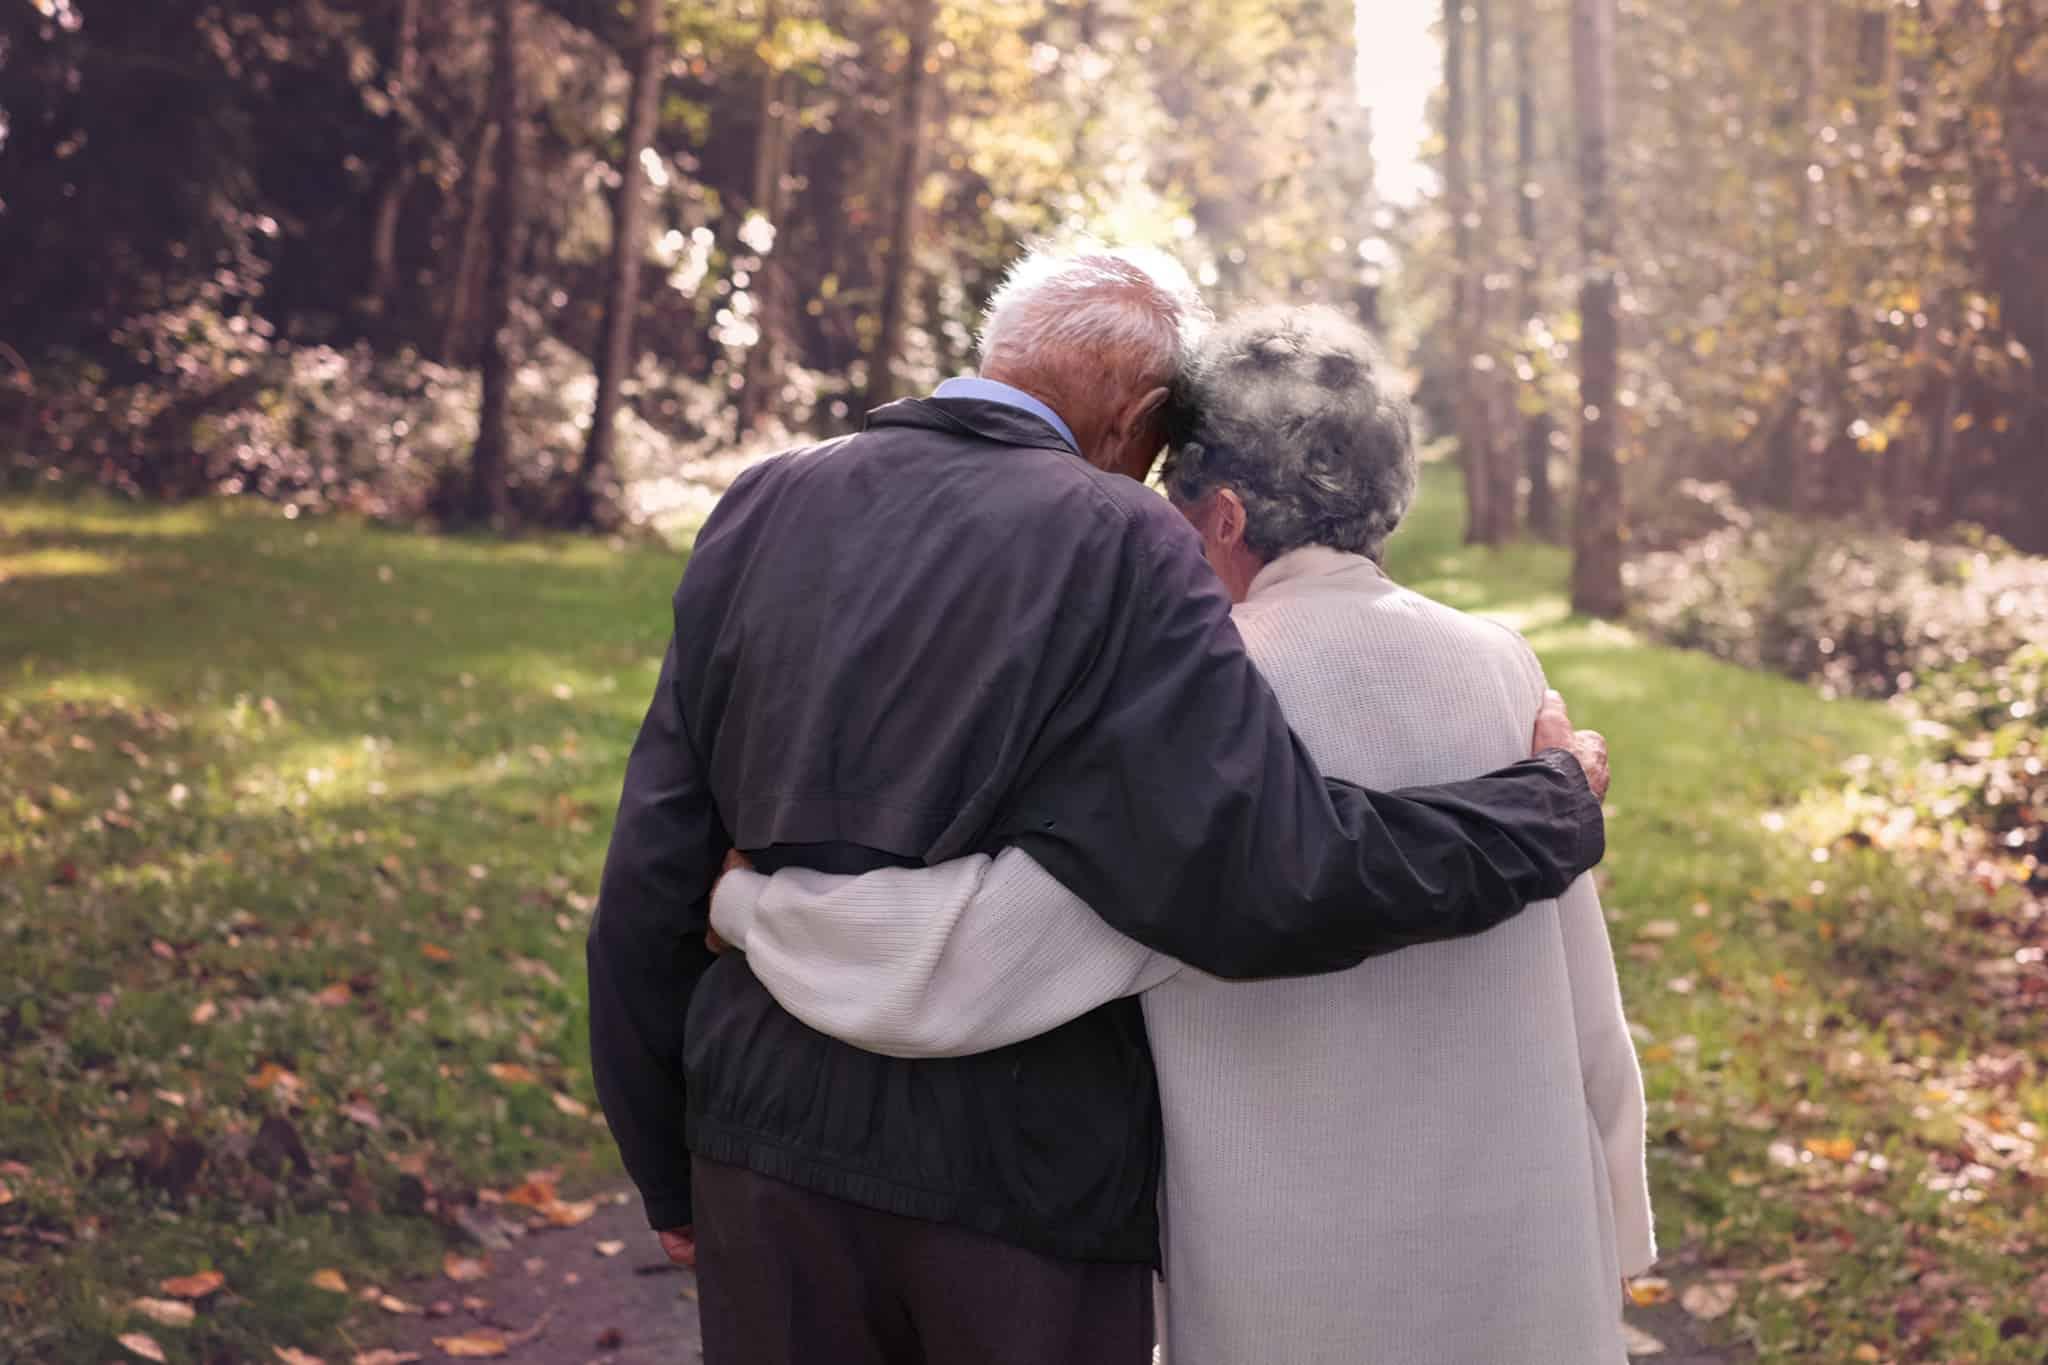 casal de idosos abraçados e felizes